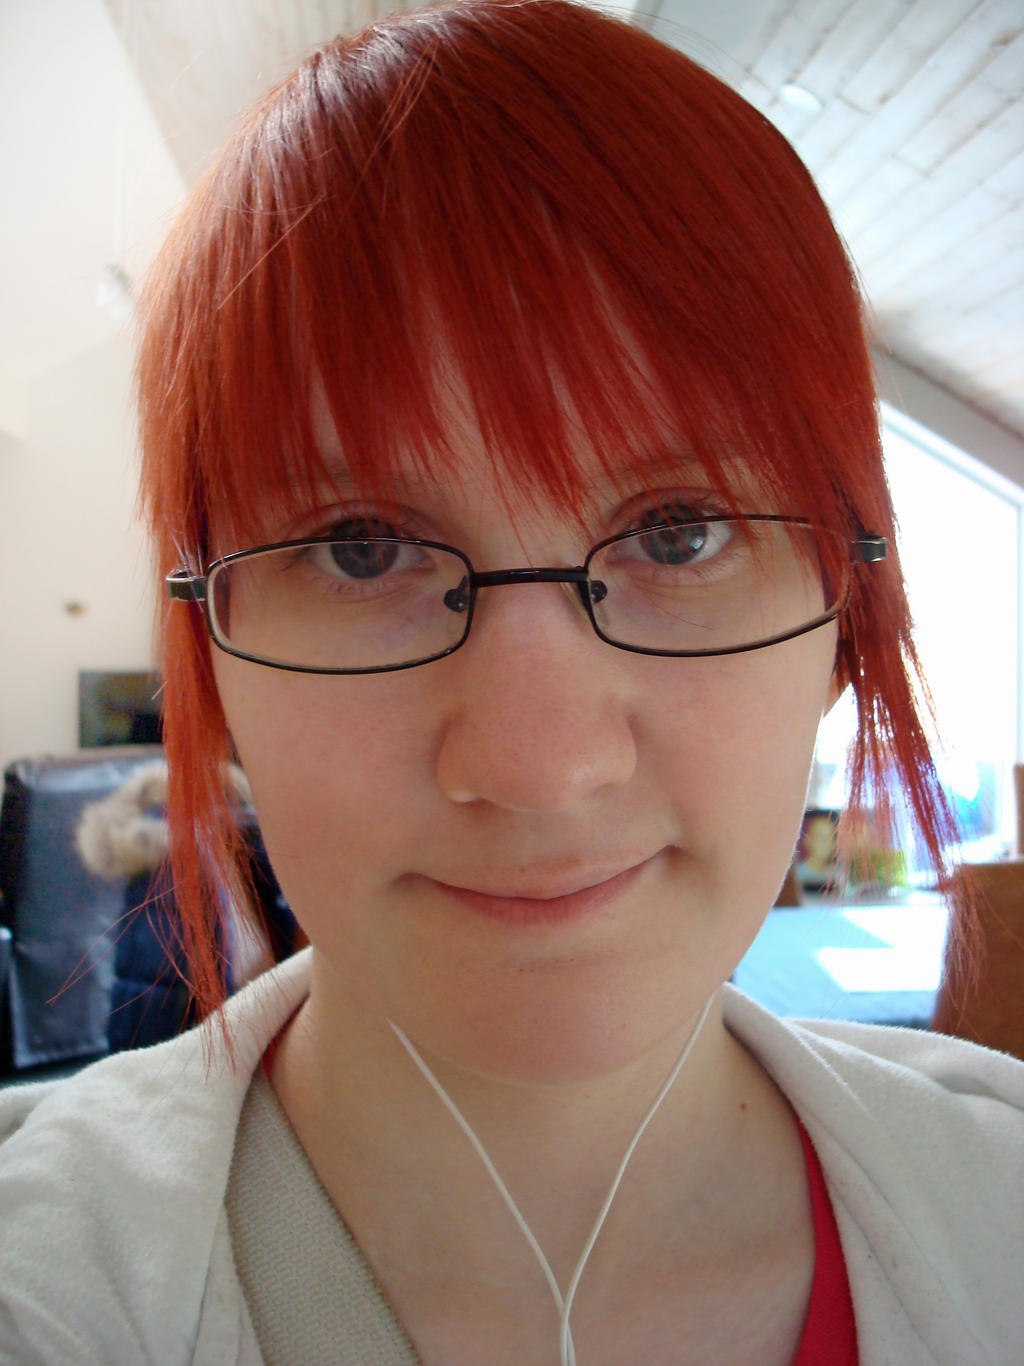 WolfOfDarkness12's Profile Picture